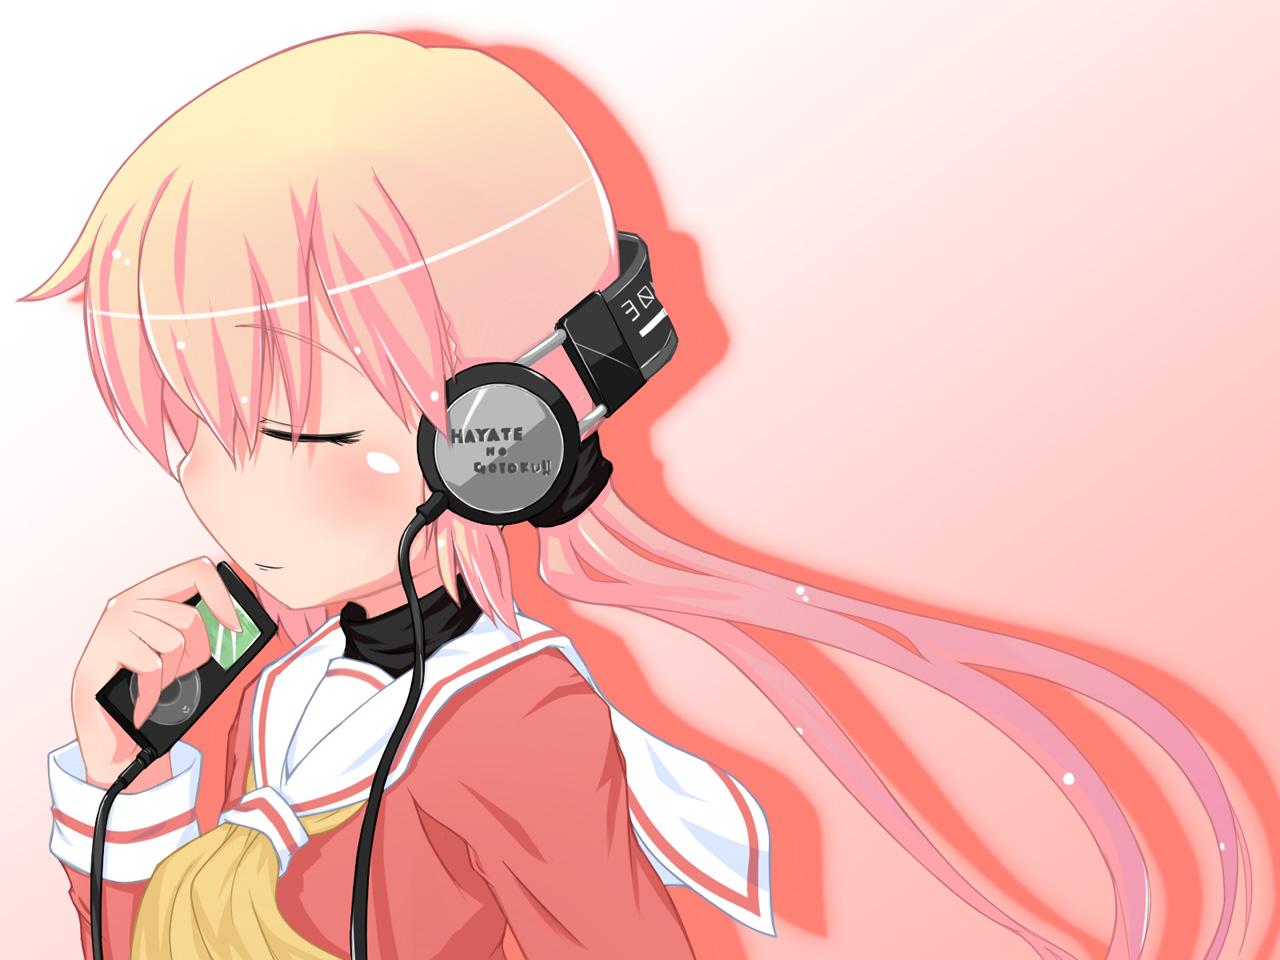 Free anime girl music phone wallpaper by ash_ketchump